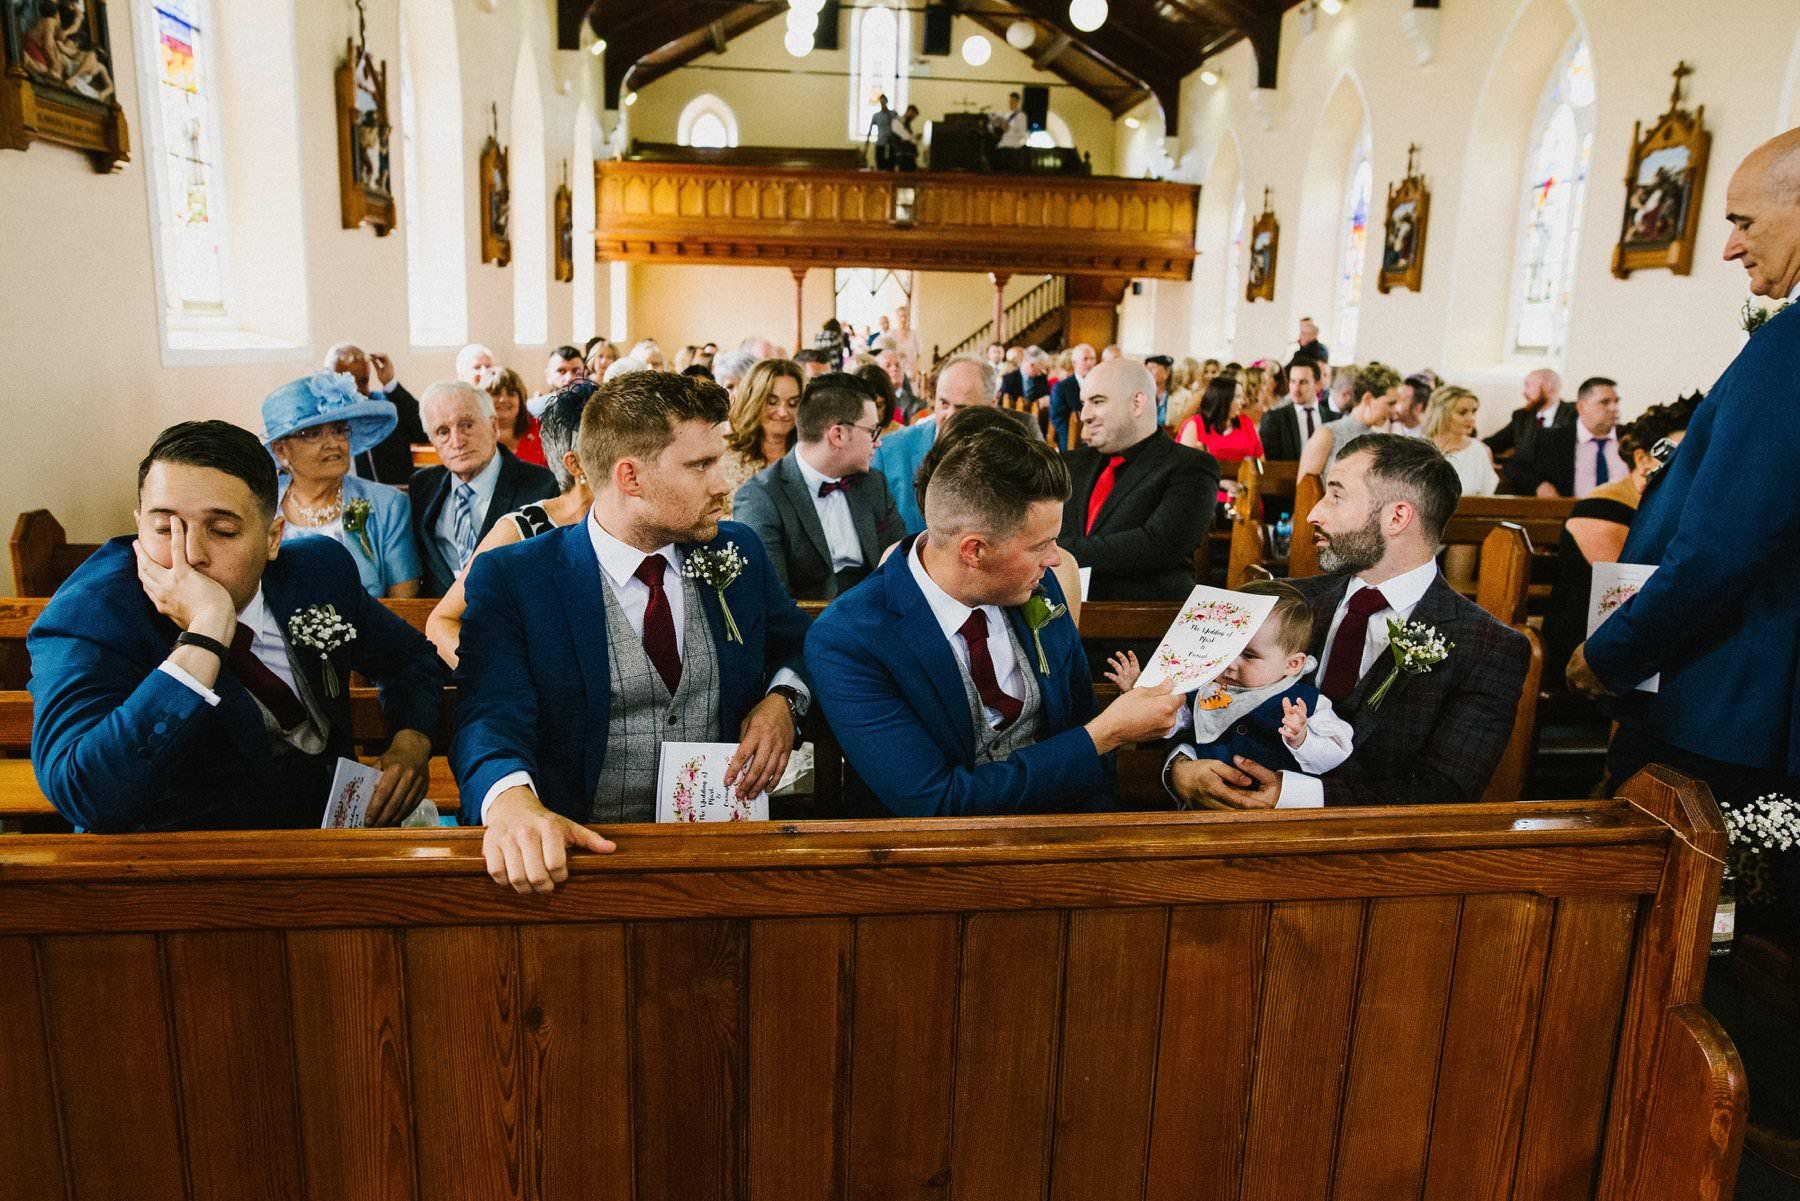 bored groomsmen documentary wedding photography